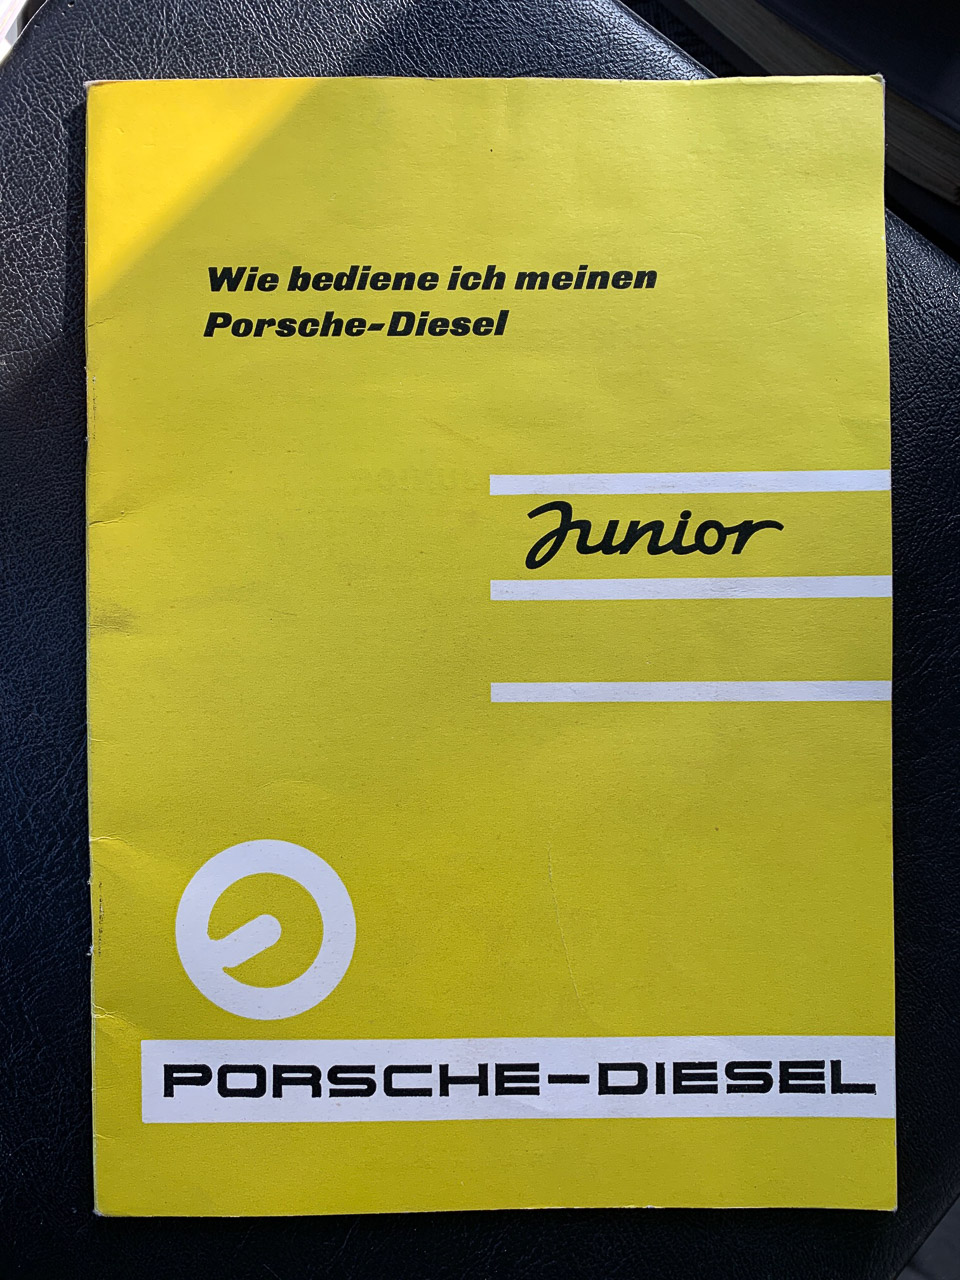 #23 1963 Porsche P109 Junior